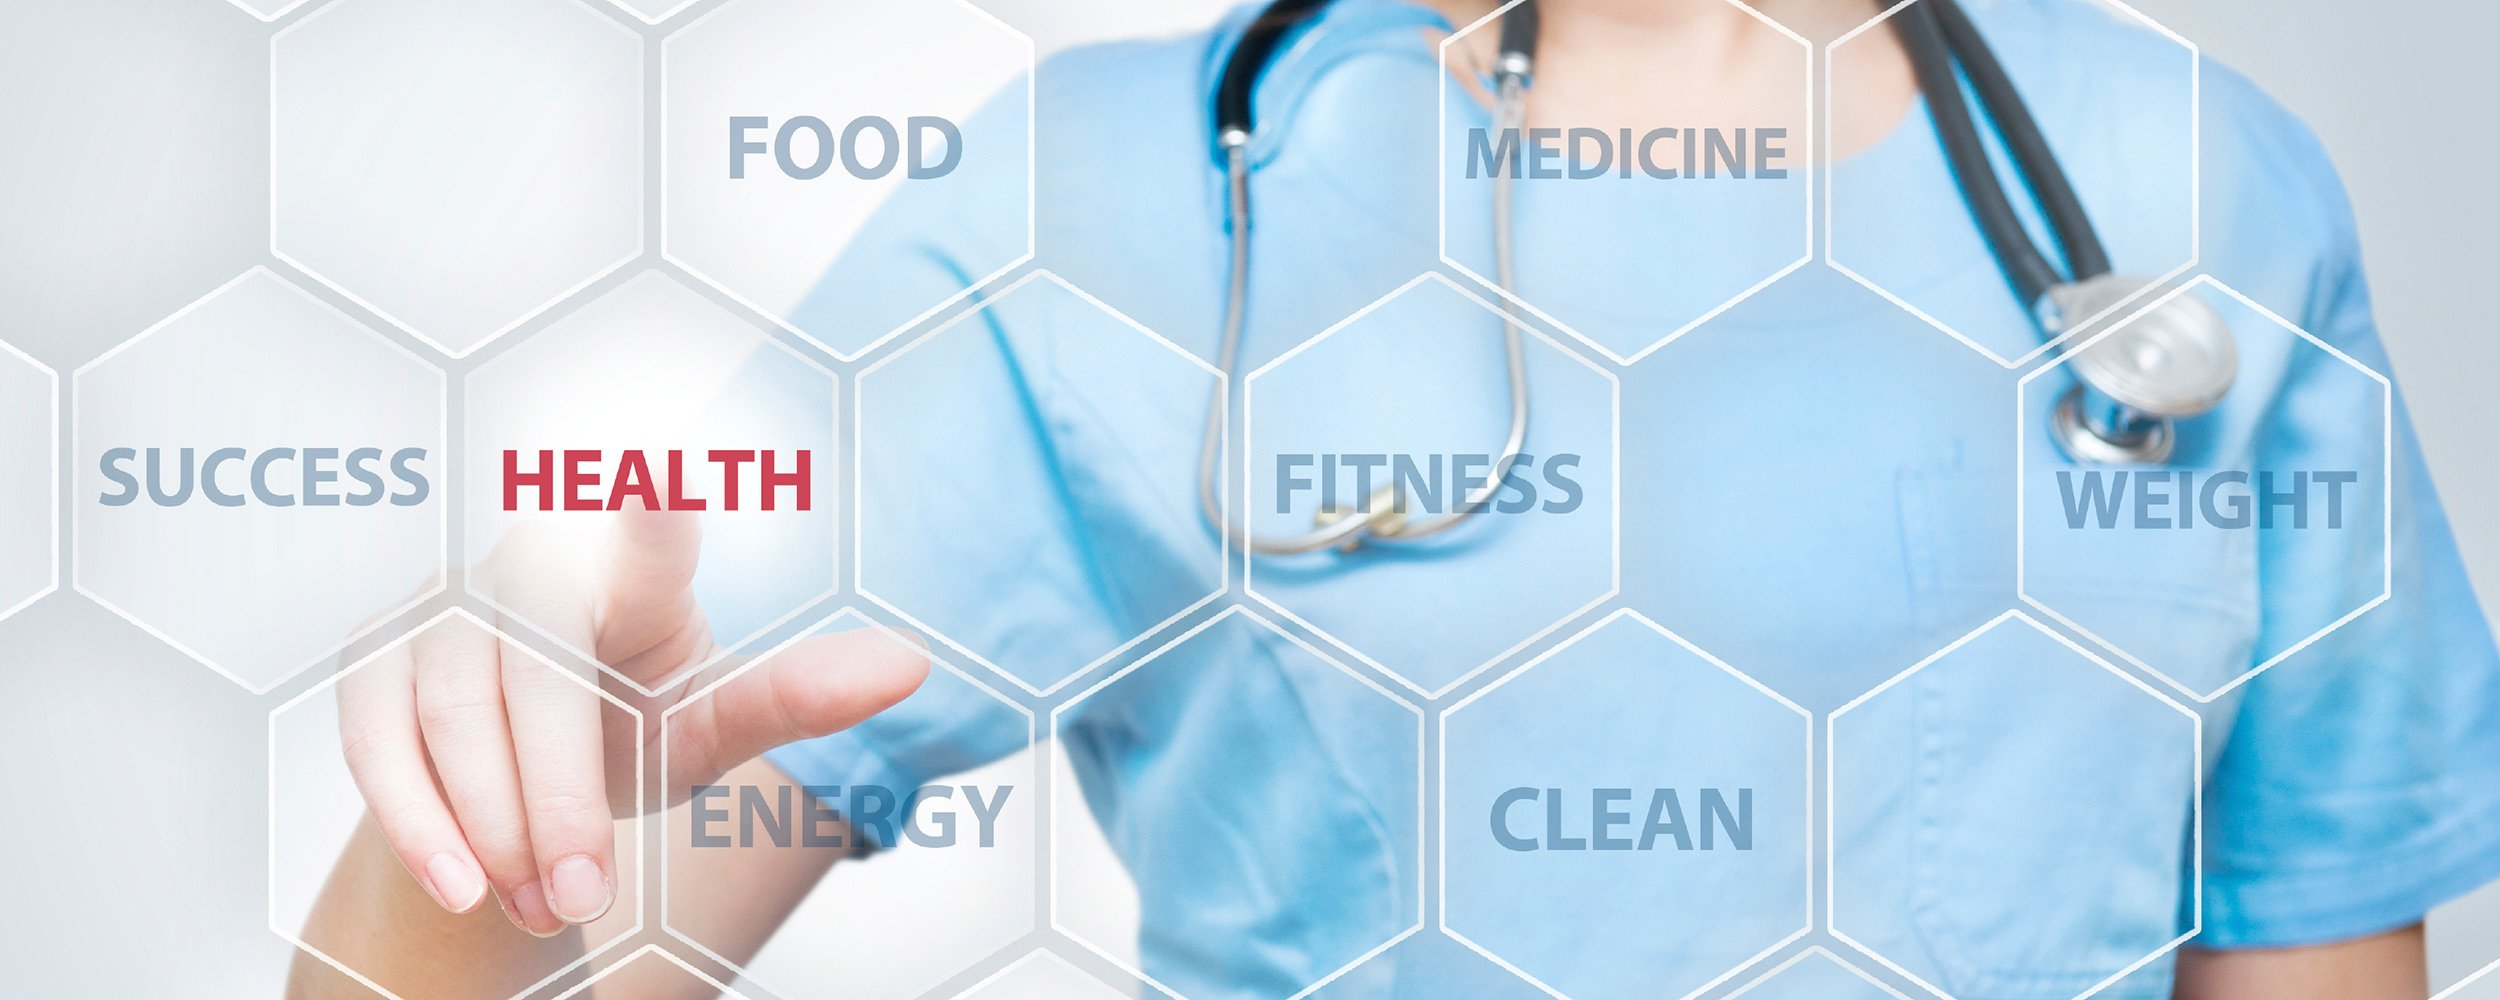 FDA Approves Wixela Inhub (fluticasone propionate and salmeterol inhalation powder, USP), First Generic of Advair Diskus